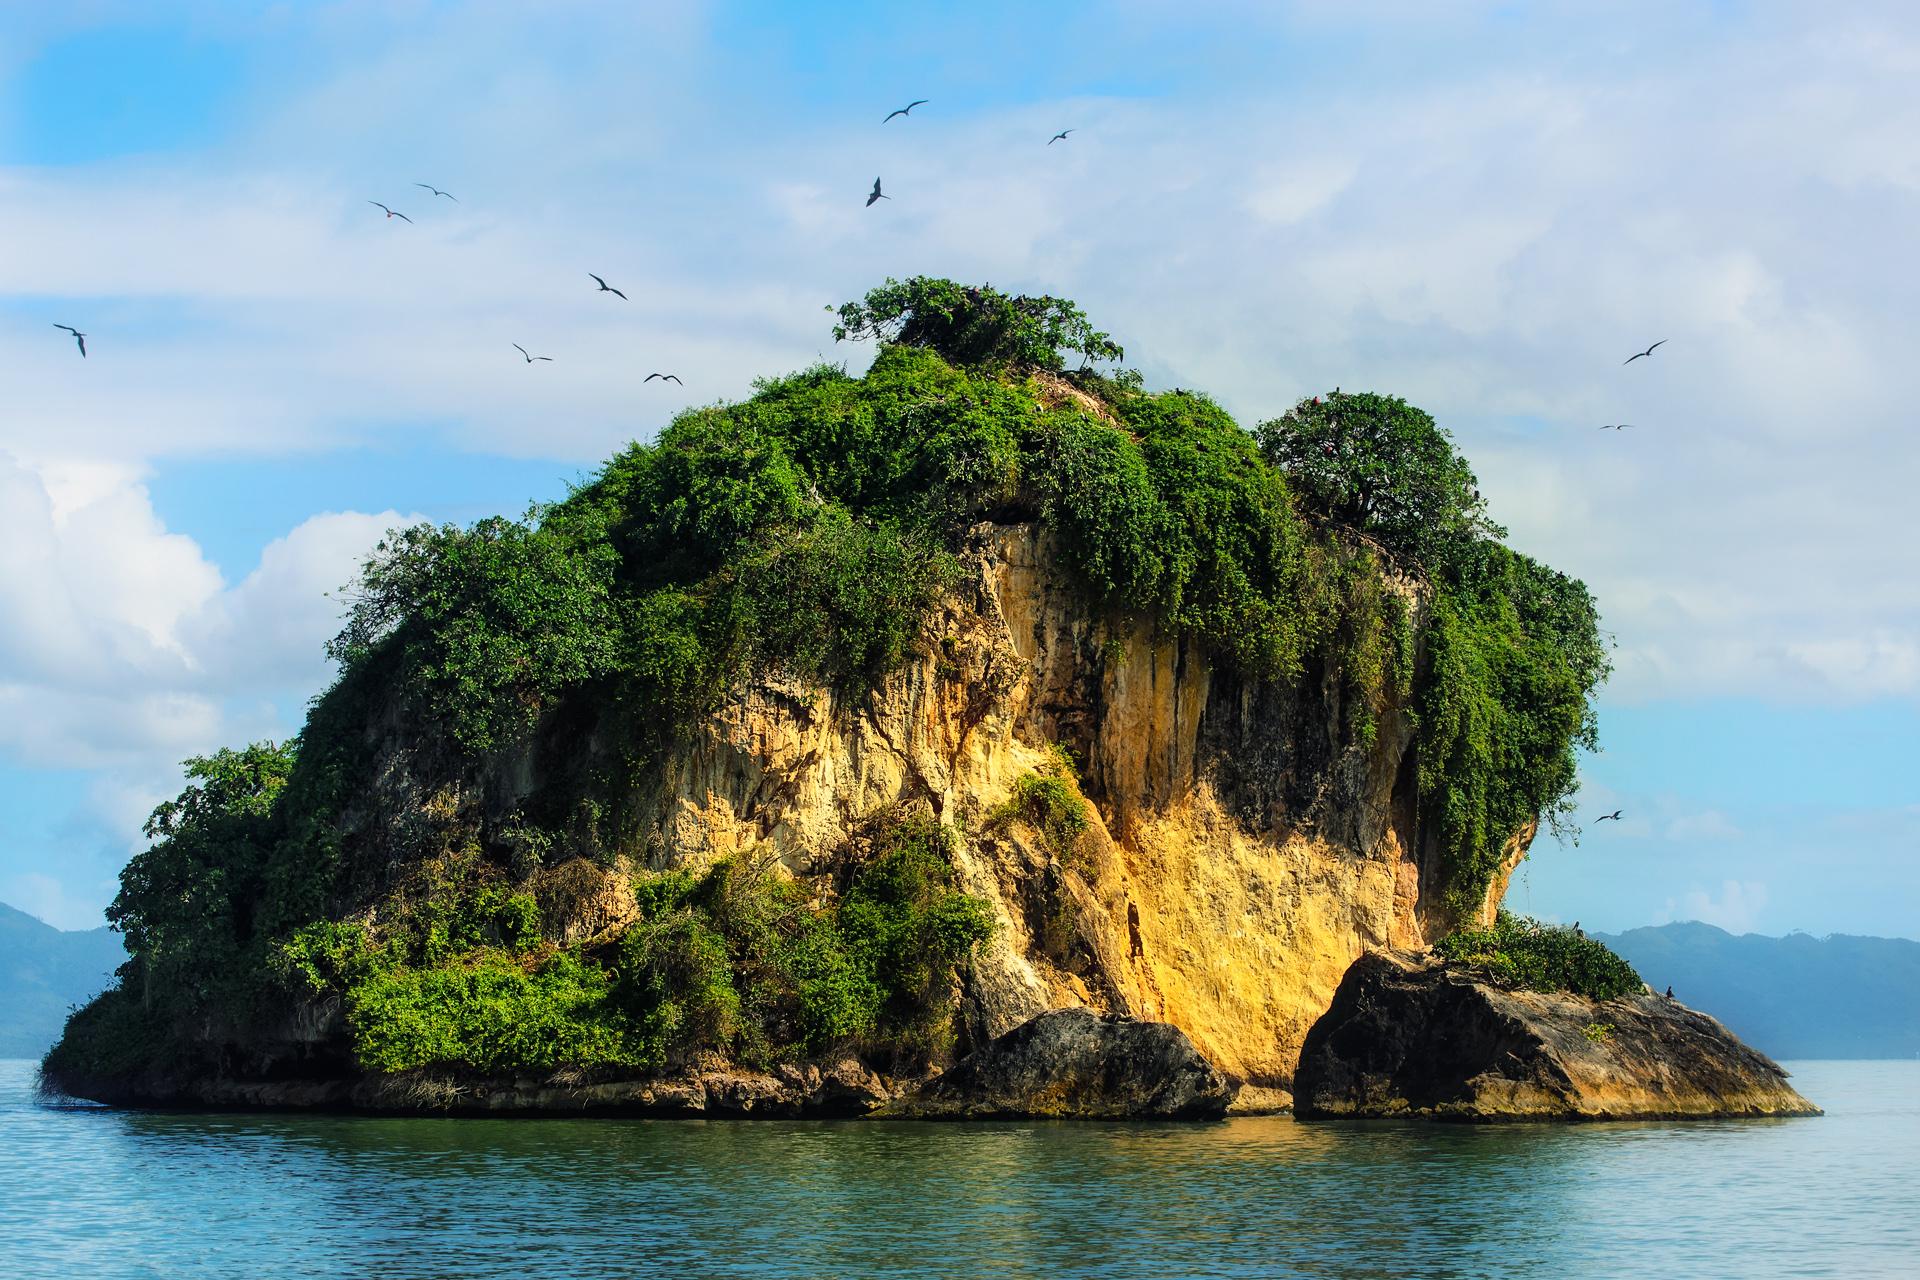 Dominican Republic Los Haitises birds island